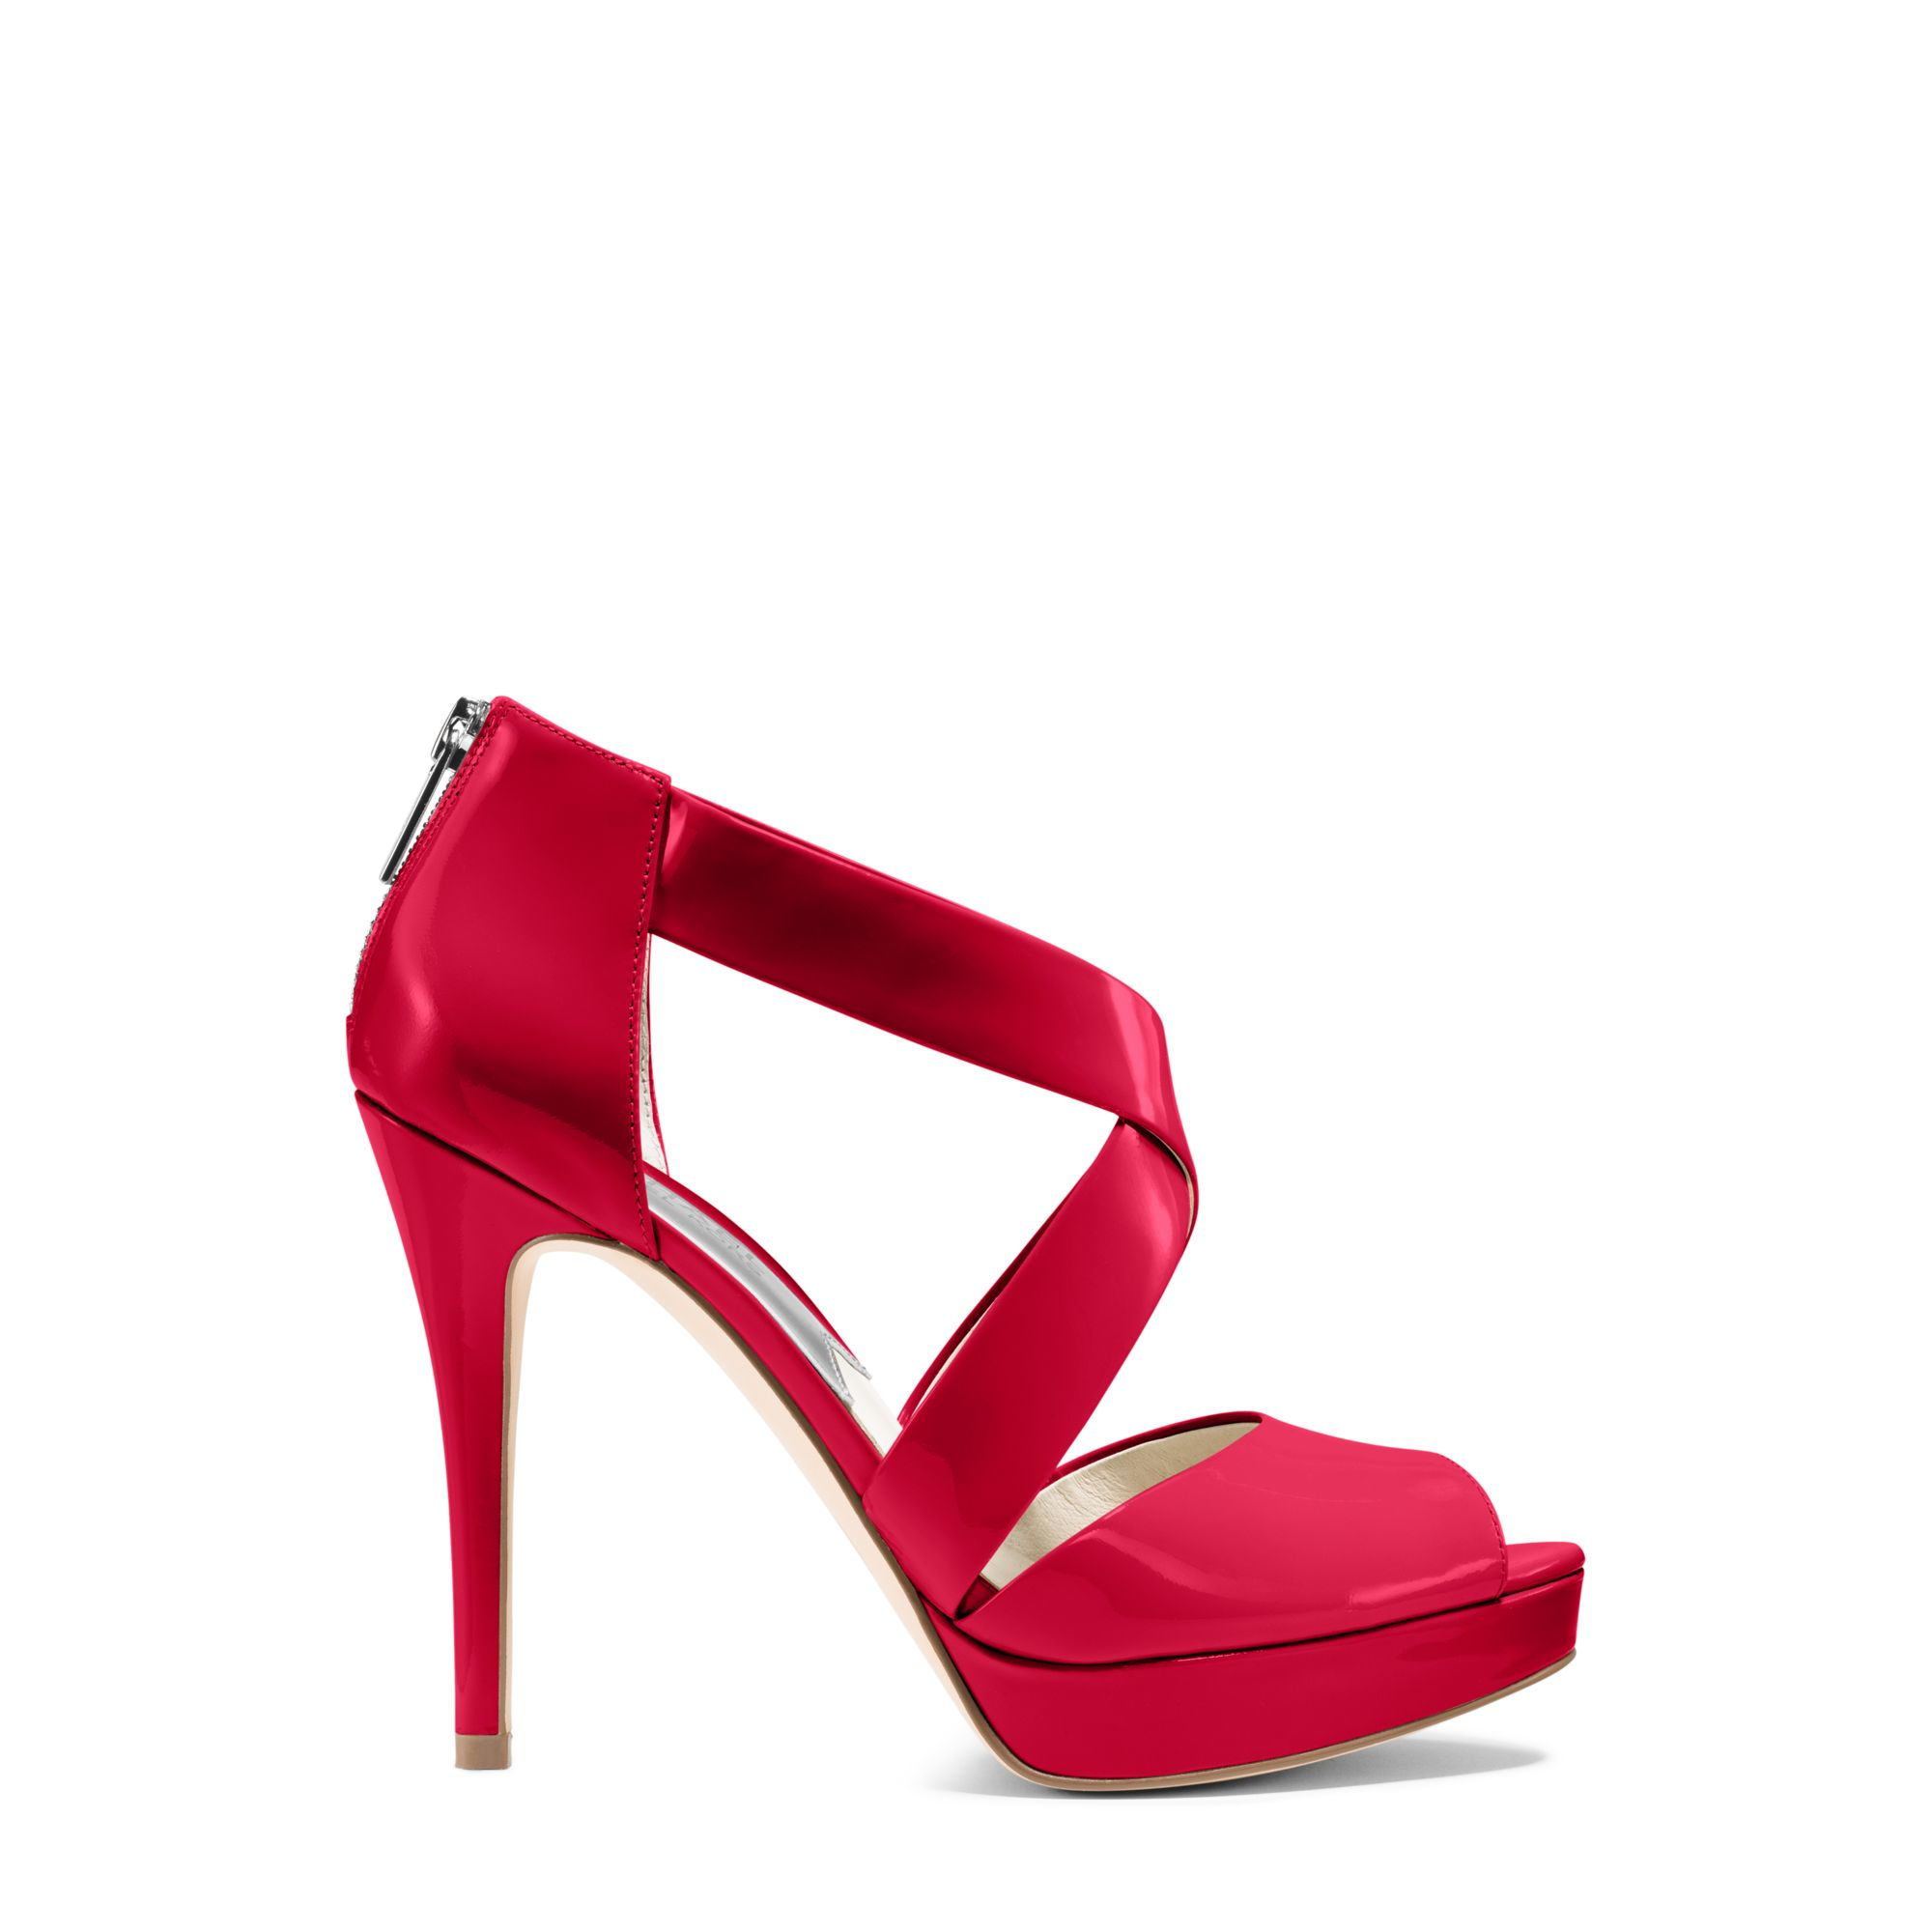 35463e87336 Lyst - Michael Kors Ariel Patent-leather Platform Sandal in Red